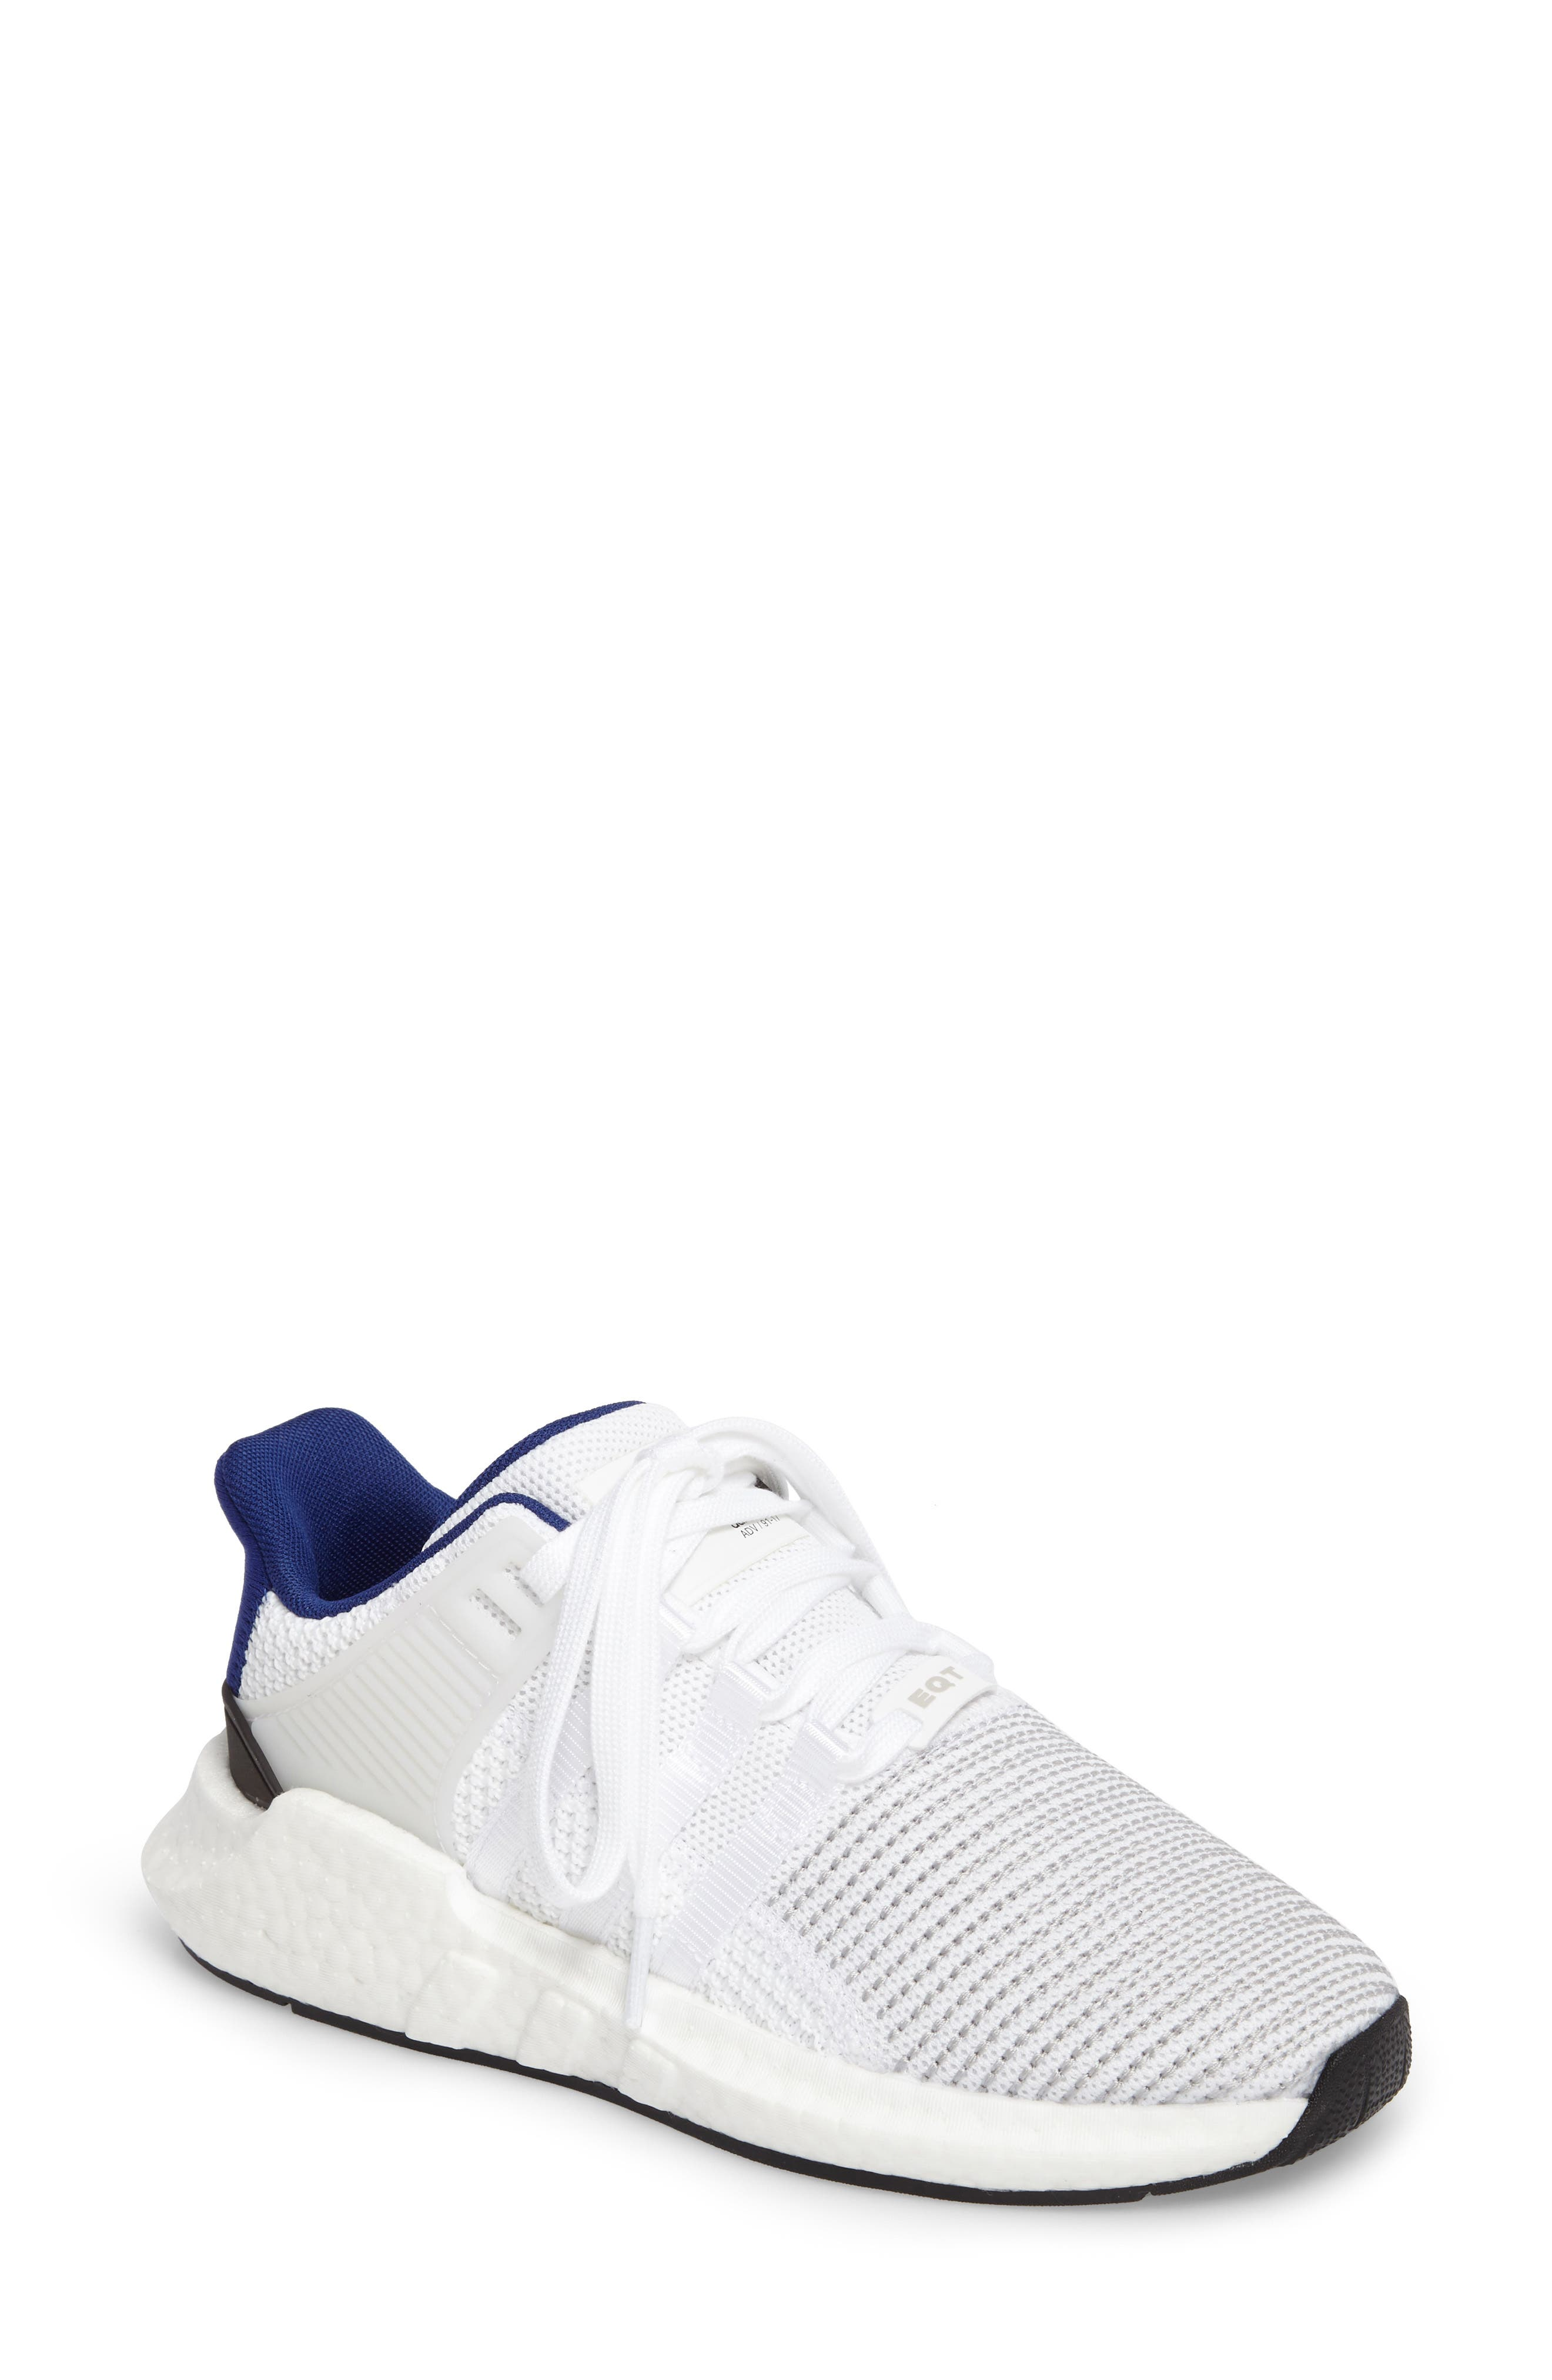 EQT Support 93/17 Sneaker,                             Main thumbnail 6, color,